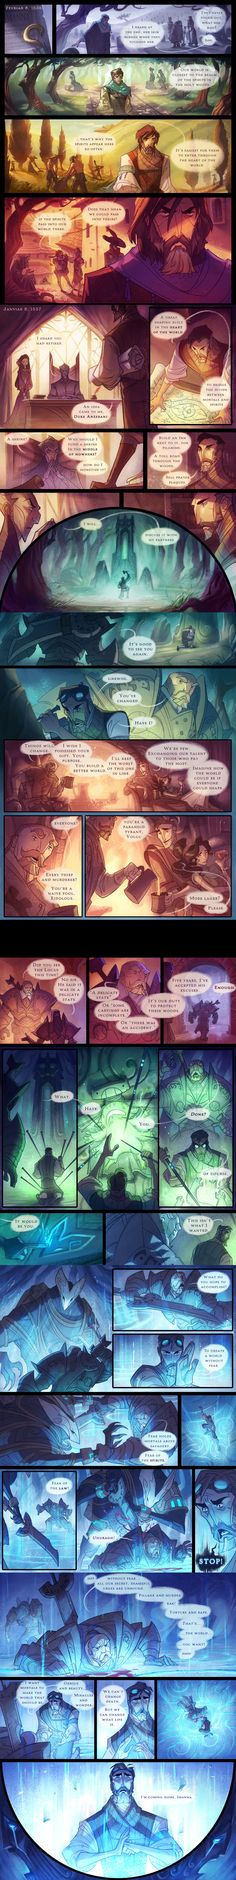 The Dawngate Chronicles - Prologue Part 2 by nicholaskole.deviantart.com on @deviantART